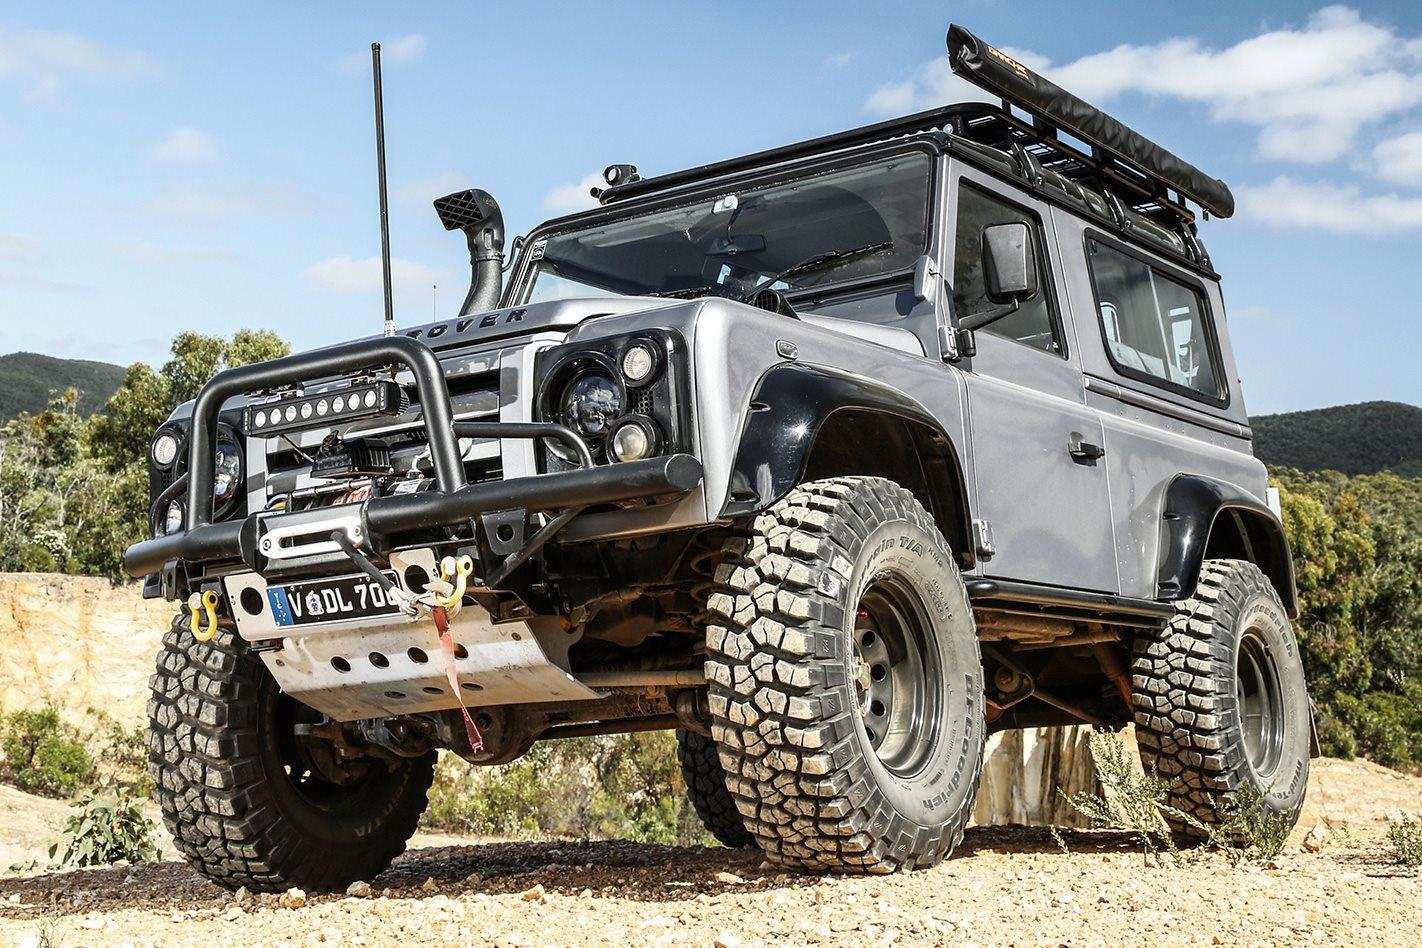 land rover defender 90 2017 custom 4x4oty contender 4x4 australia. Black Bedroom Furniture Sets. Home Design Ideas